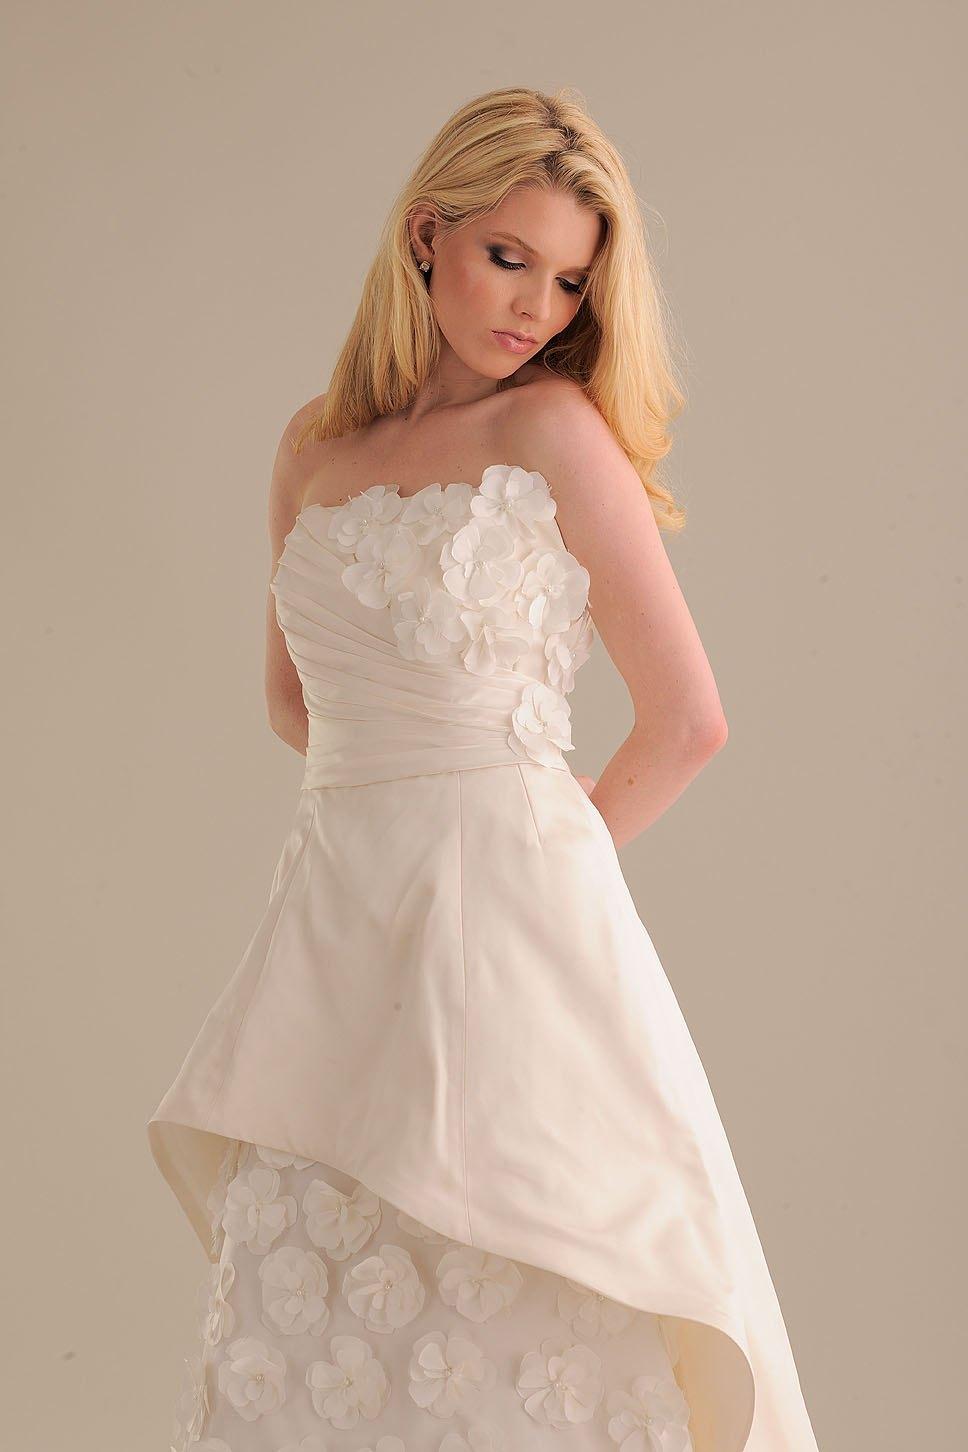 No-ordinary-bride-wedding-dress-846-detail.full